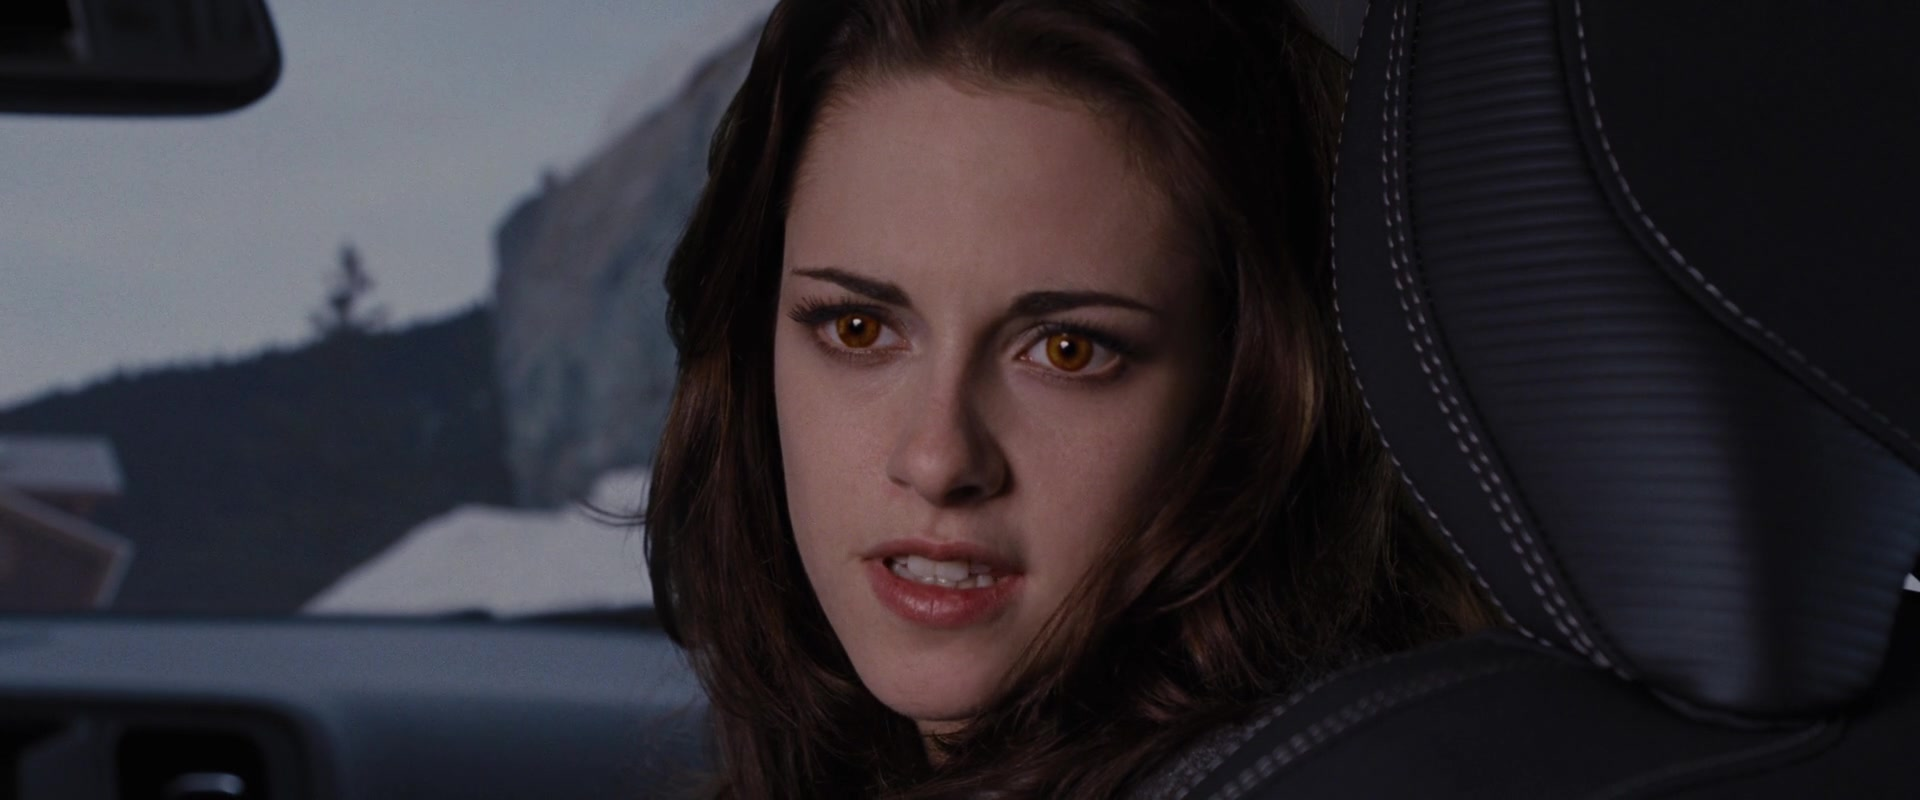 The Twilight Saga: Breaking Dawn - Part 2 (2012) - Photo Gallery Twilight saga breaking dawn part 2 photos